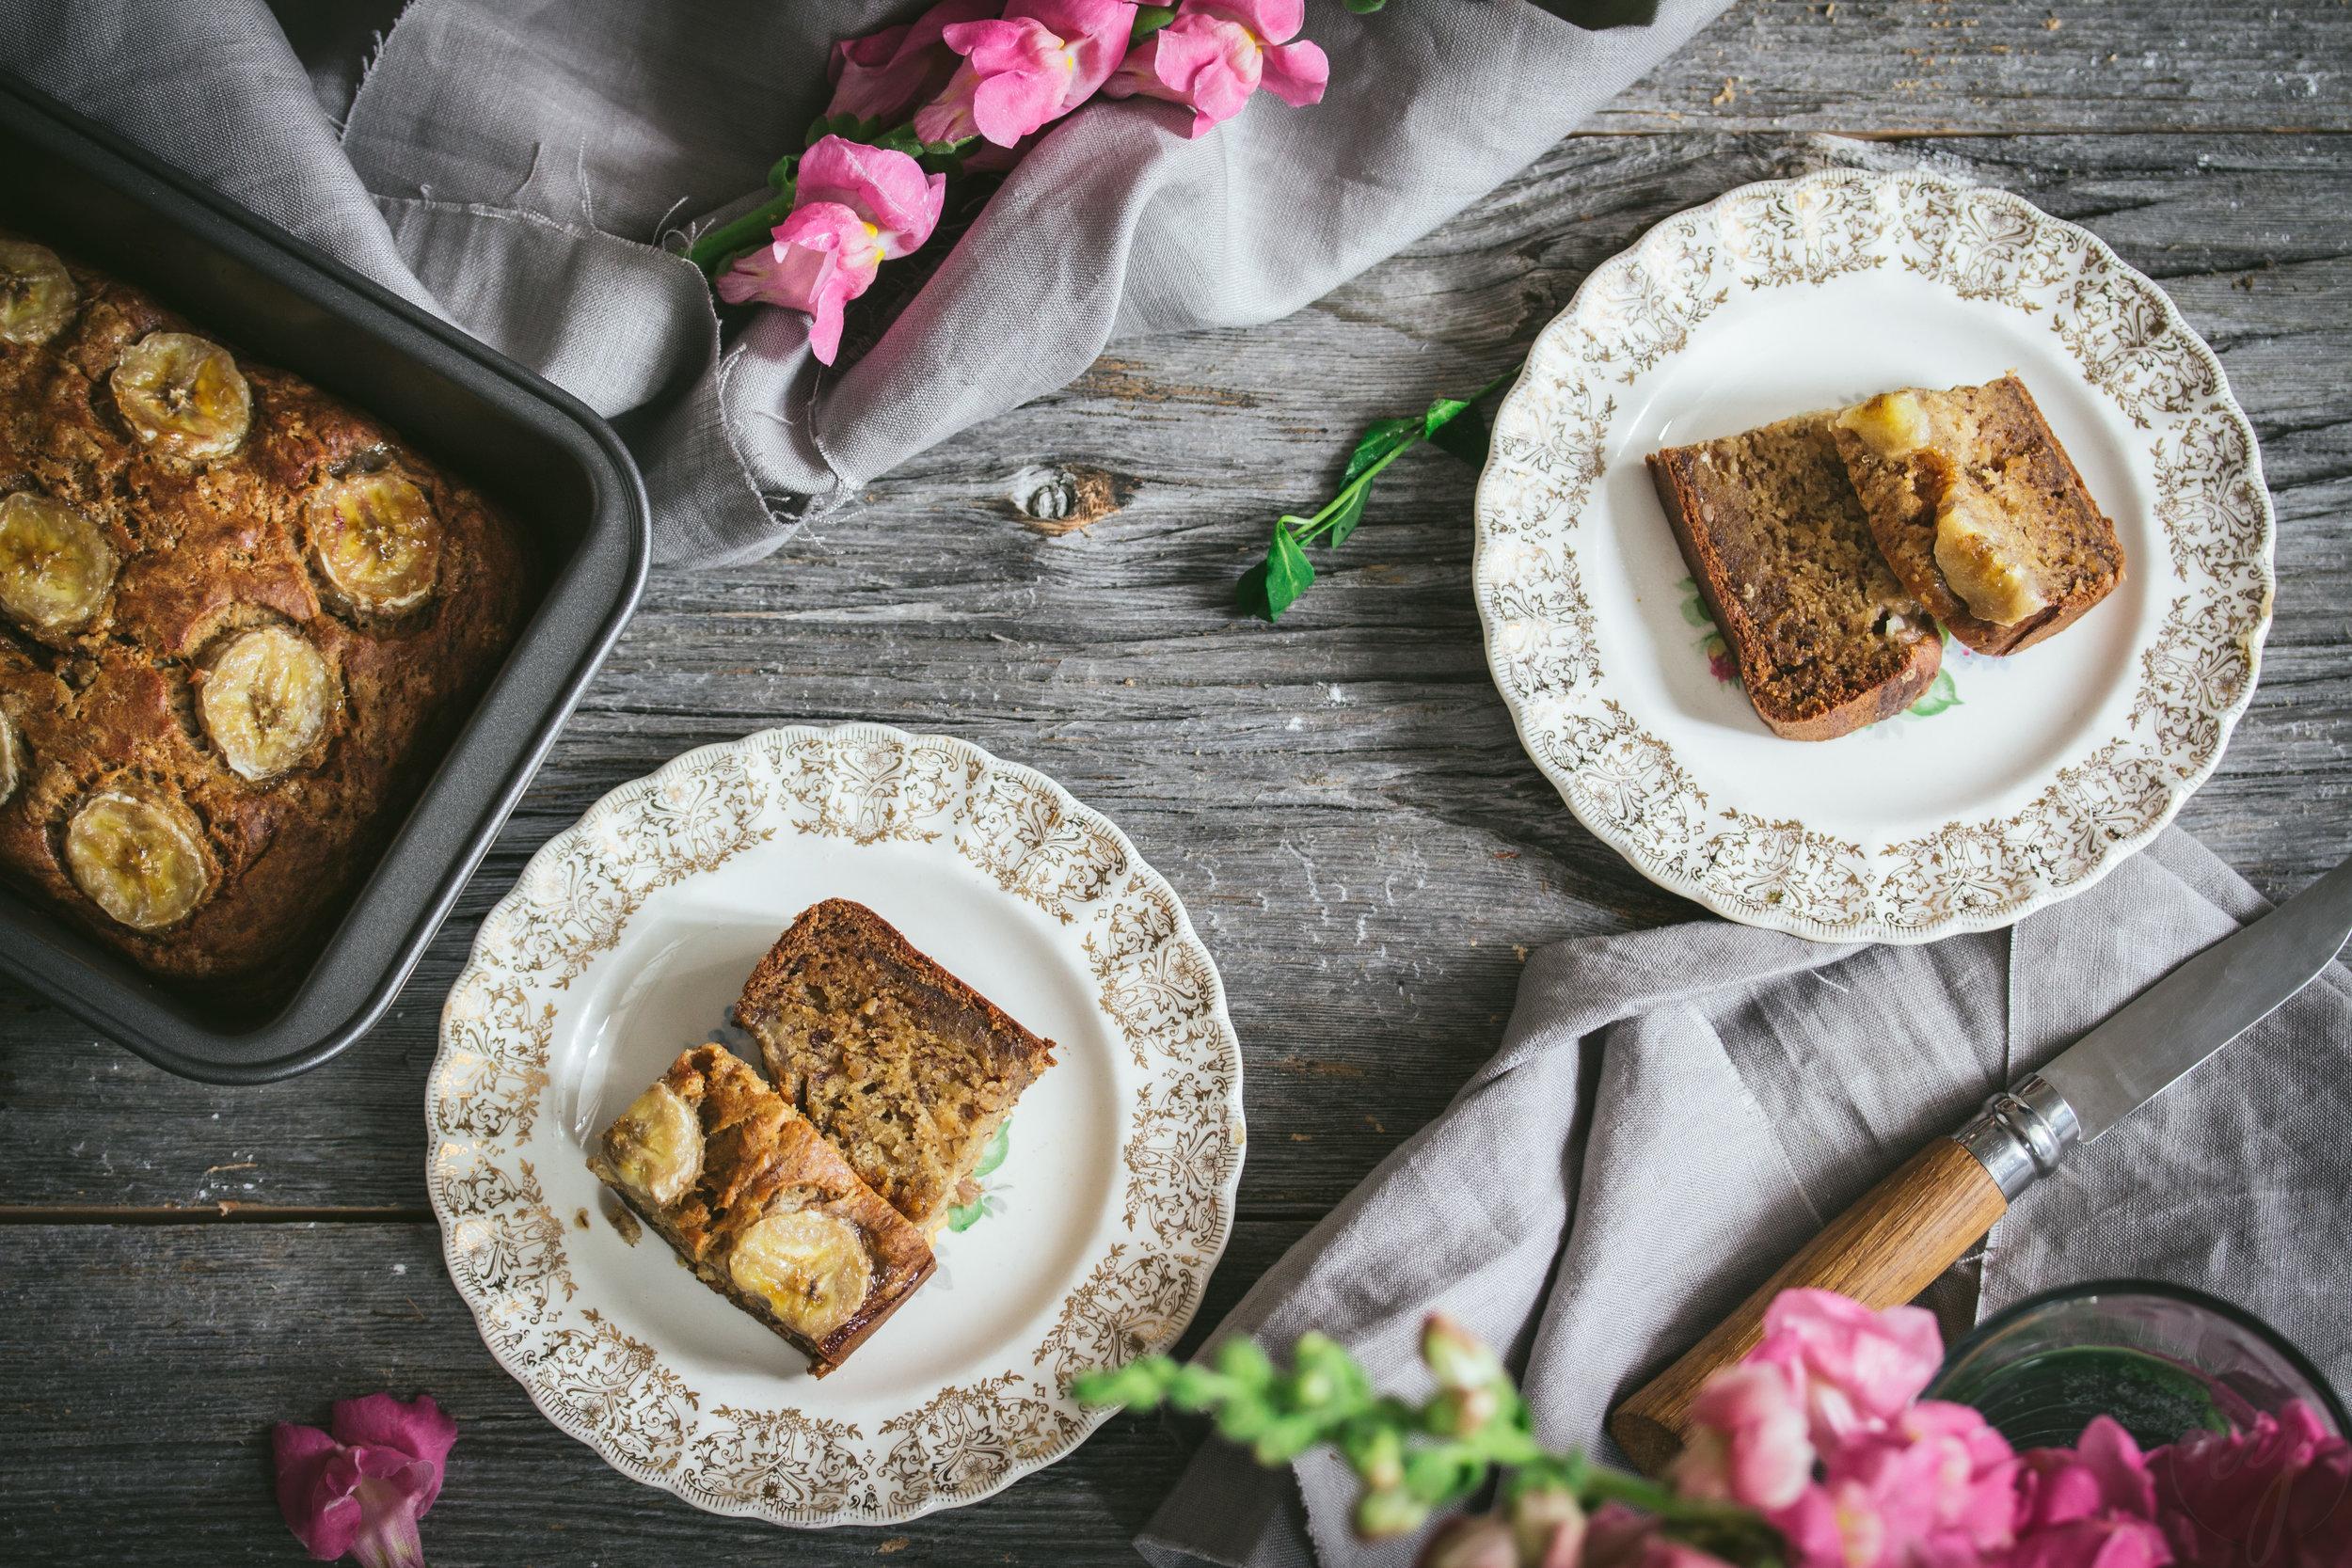 Rustic-Banana-Bread-Ify-Yani